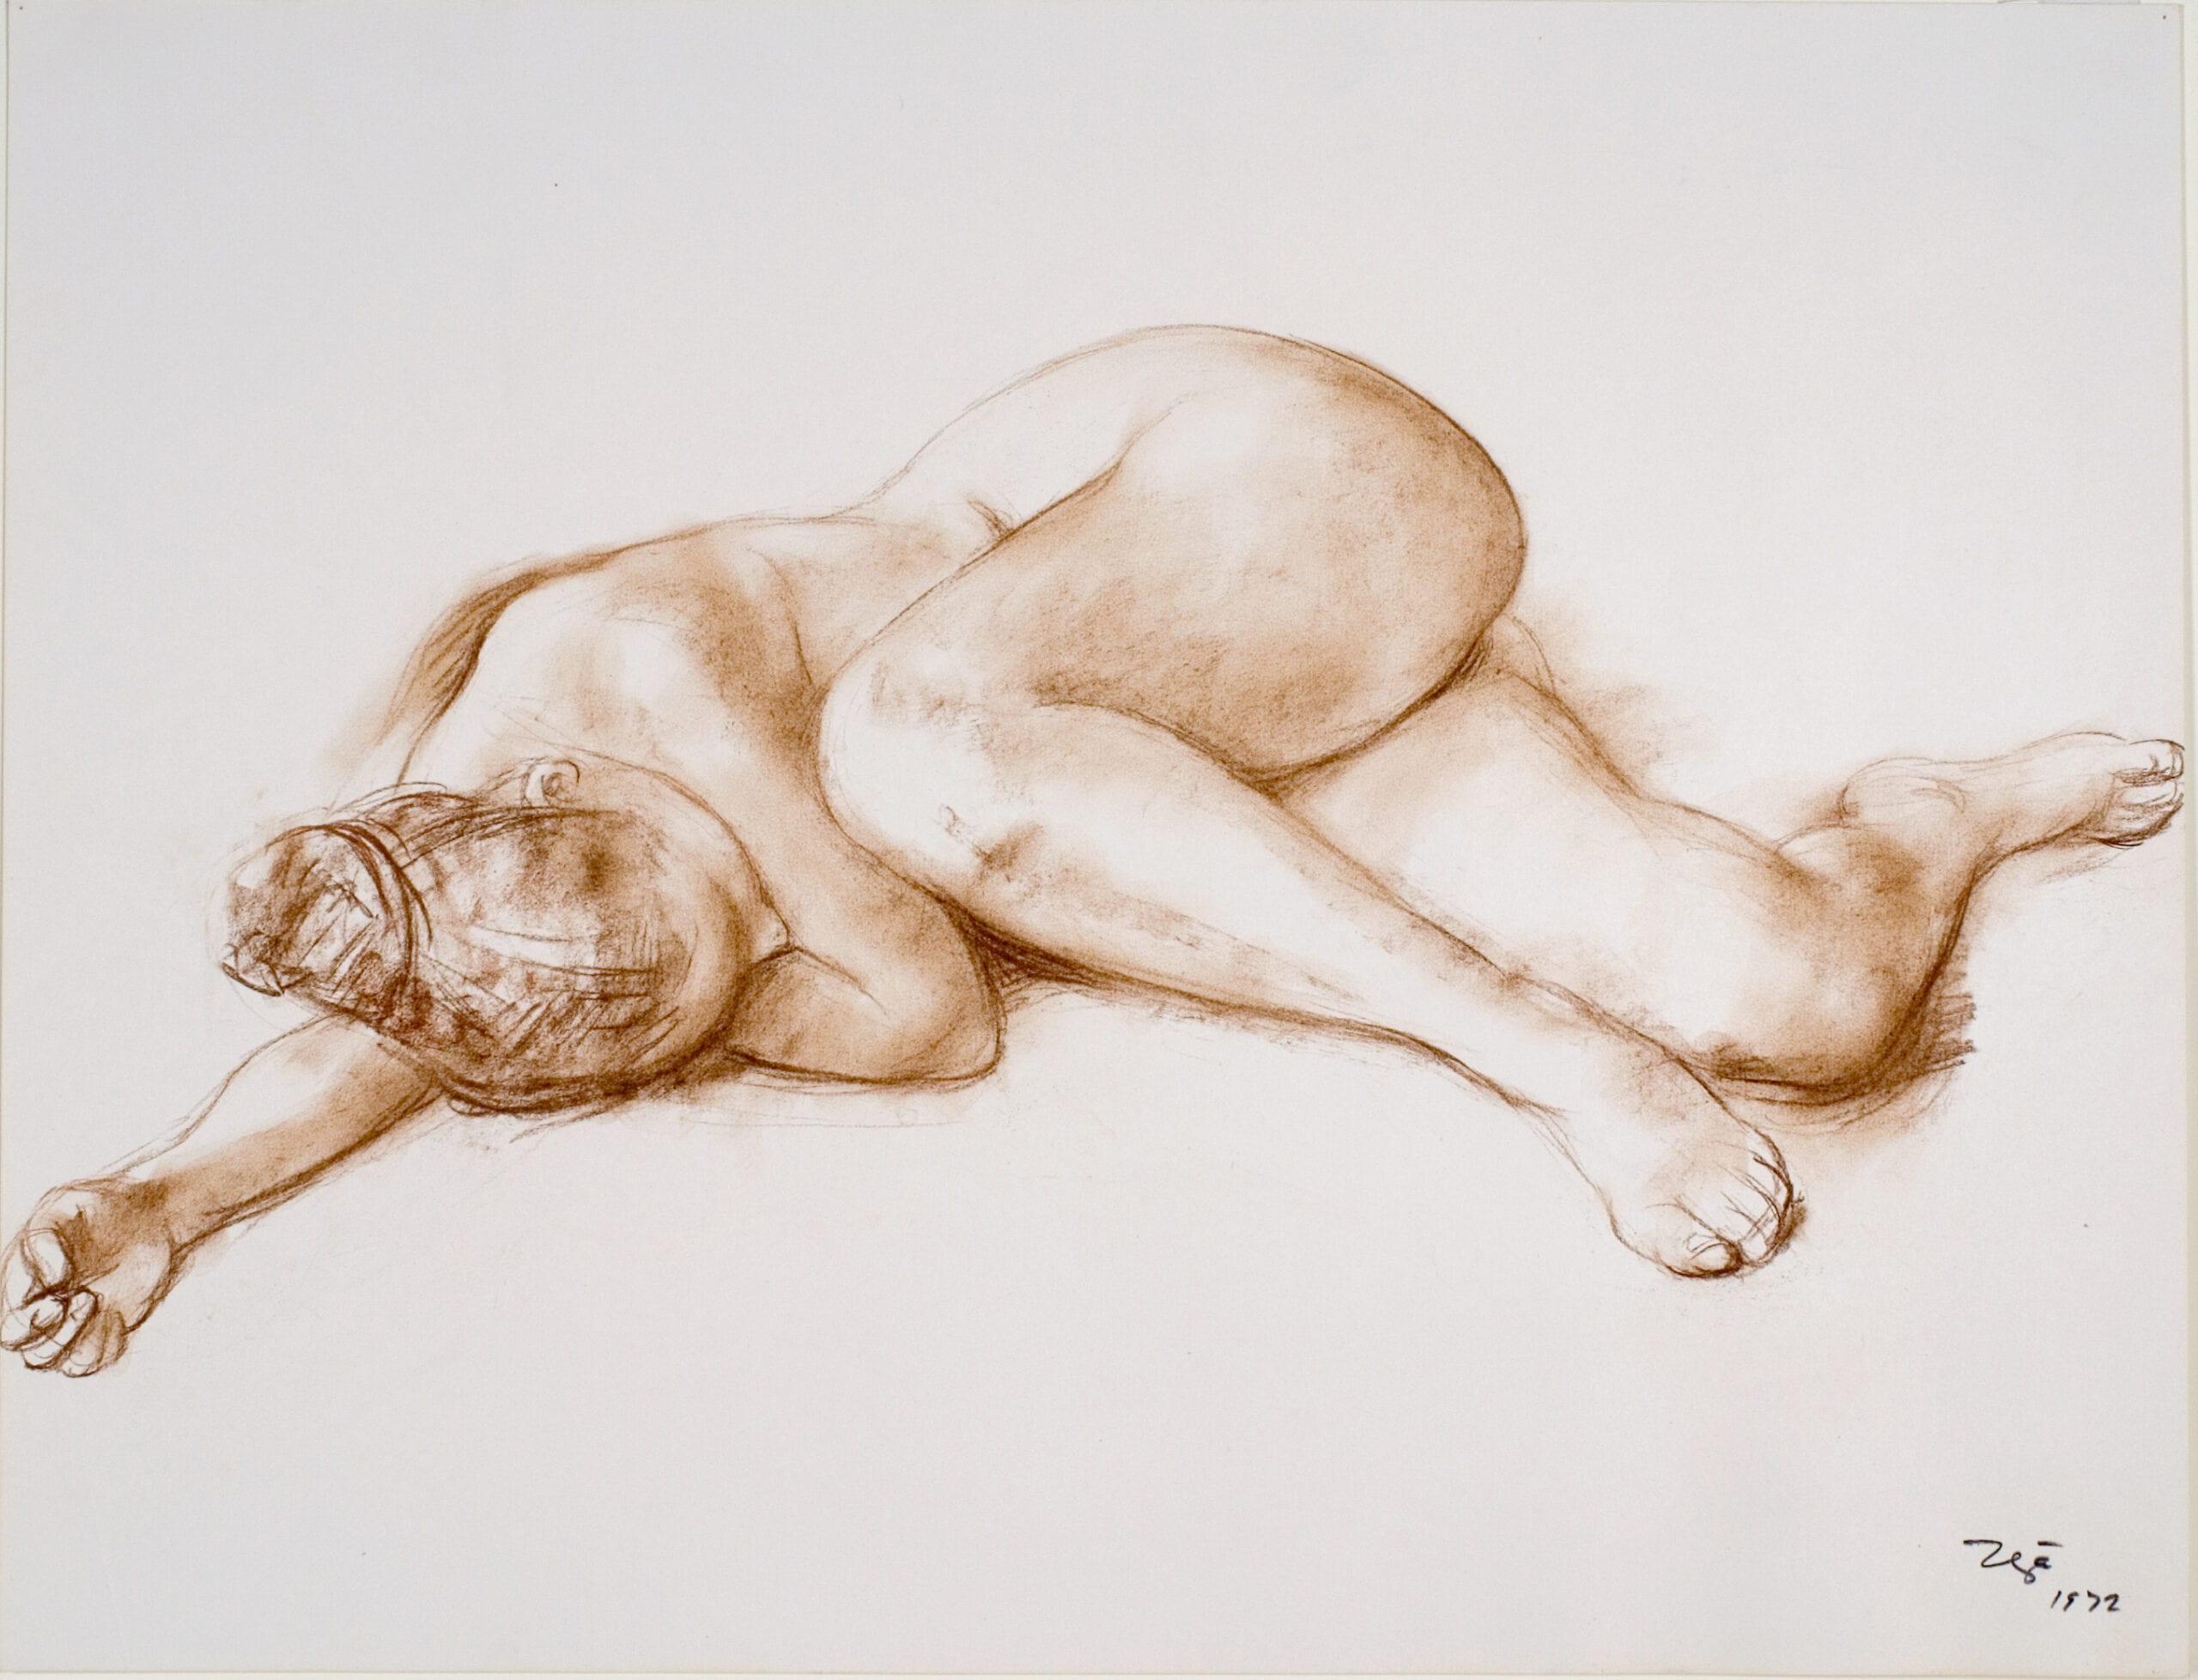 "Fransisco Zúñiga, Desnudo Reclinado(Reclining Nude), drawing on paper, 19 ½"" x 25 ¾"", 1972."